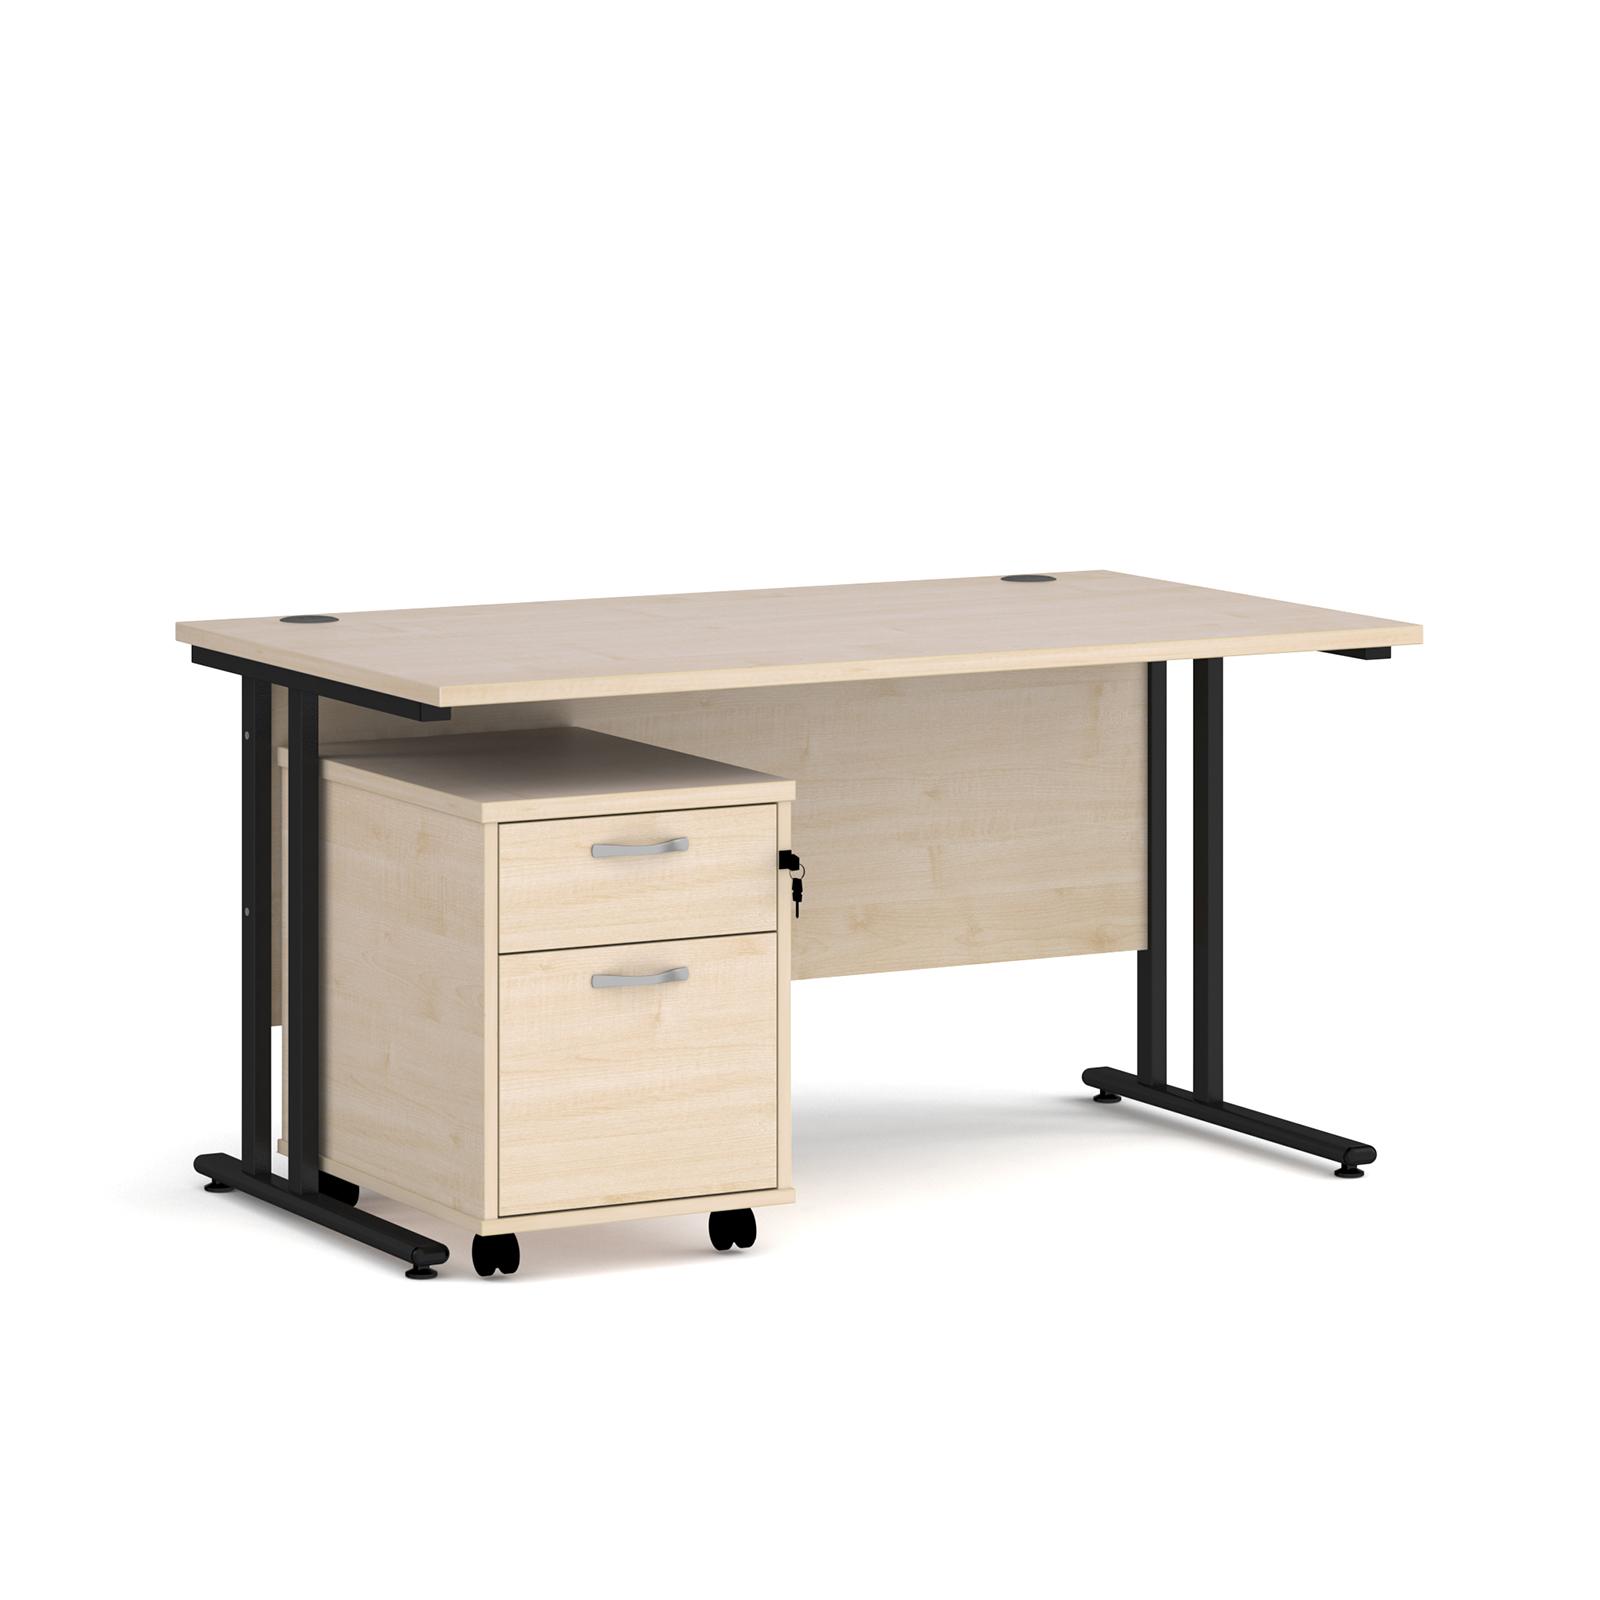 Rectangular Desks Maestro 25 straight desk 1400mm x 800mm with black cantilever frame and 2 drawer pedestal - maple